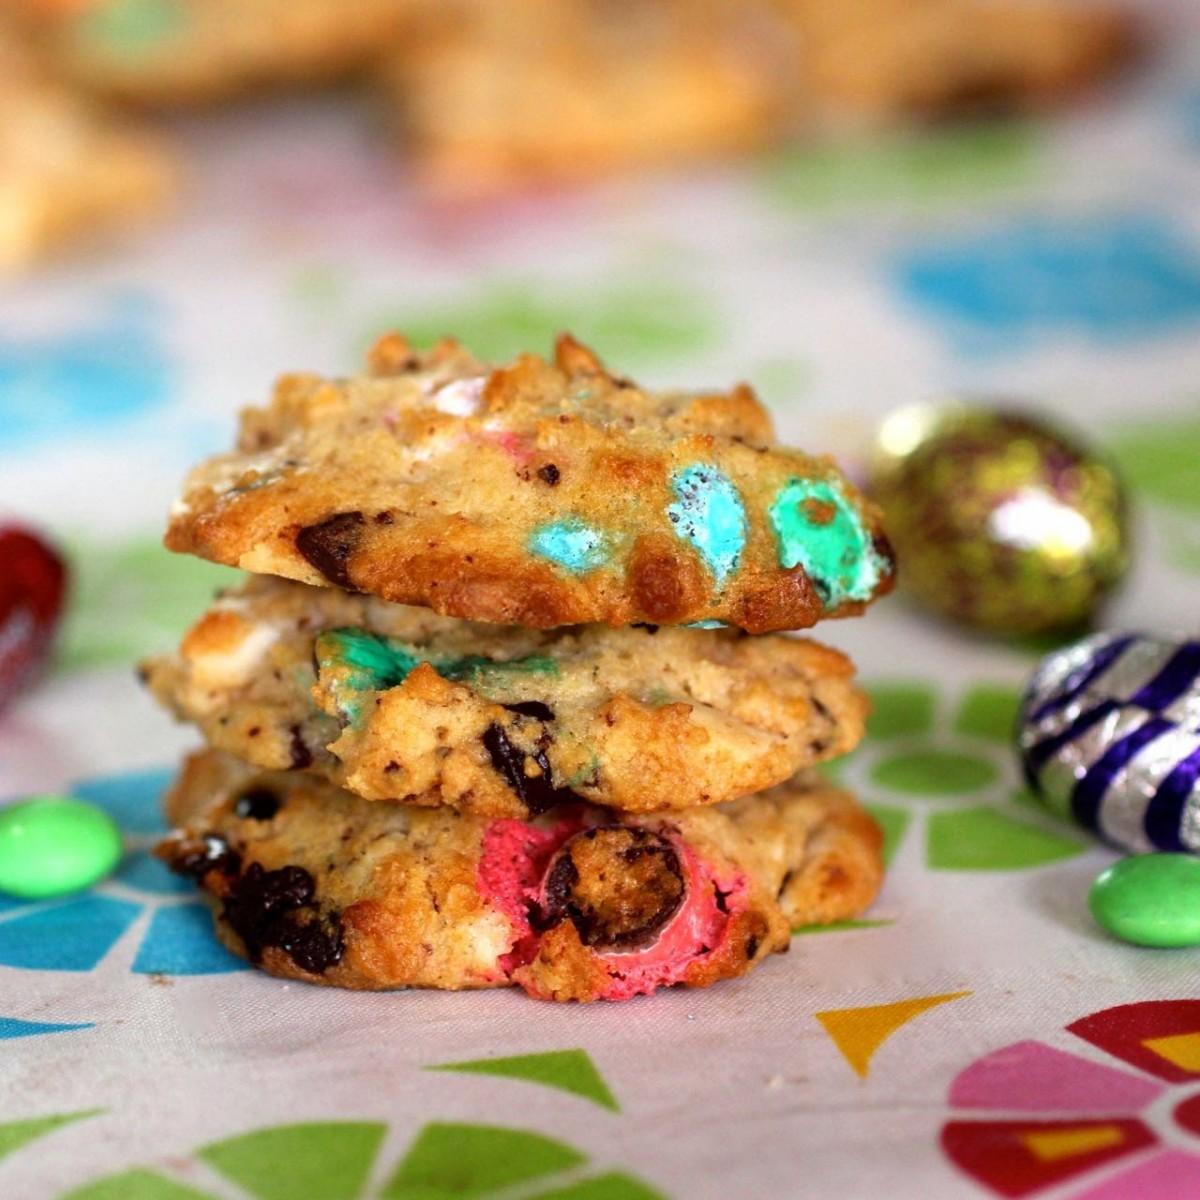 Dulce de leche chocolate chip cookies